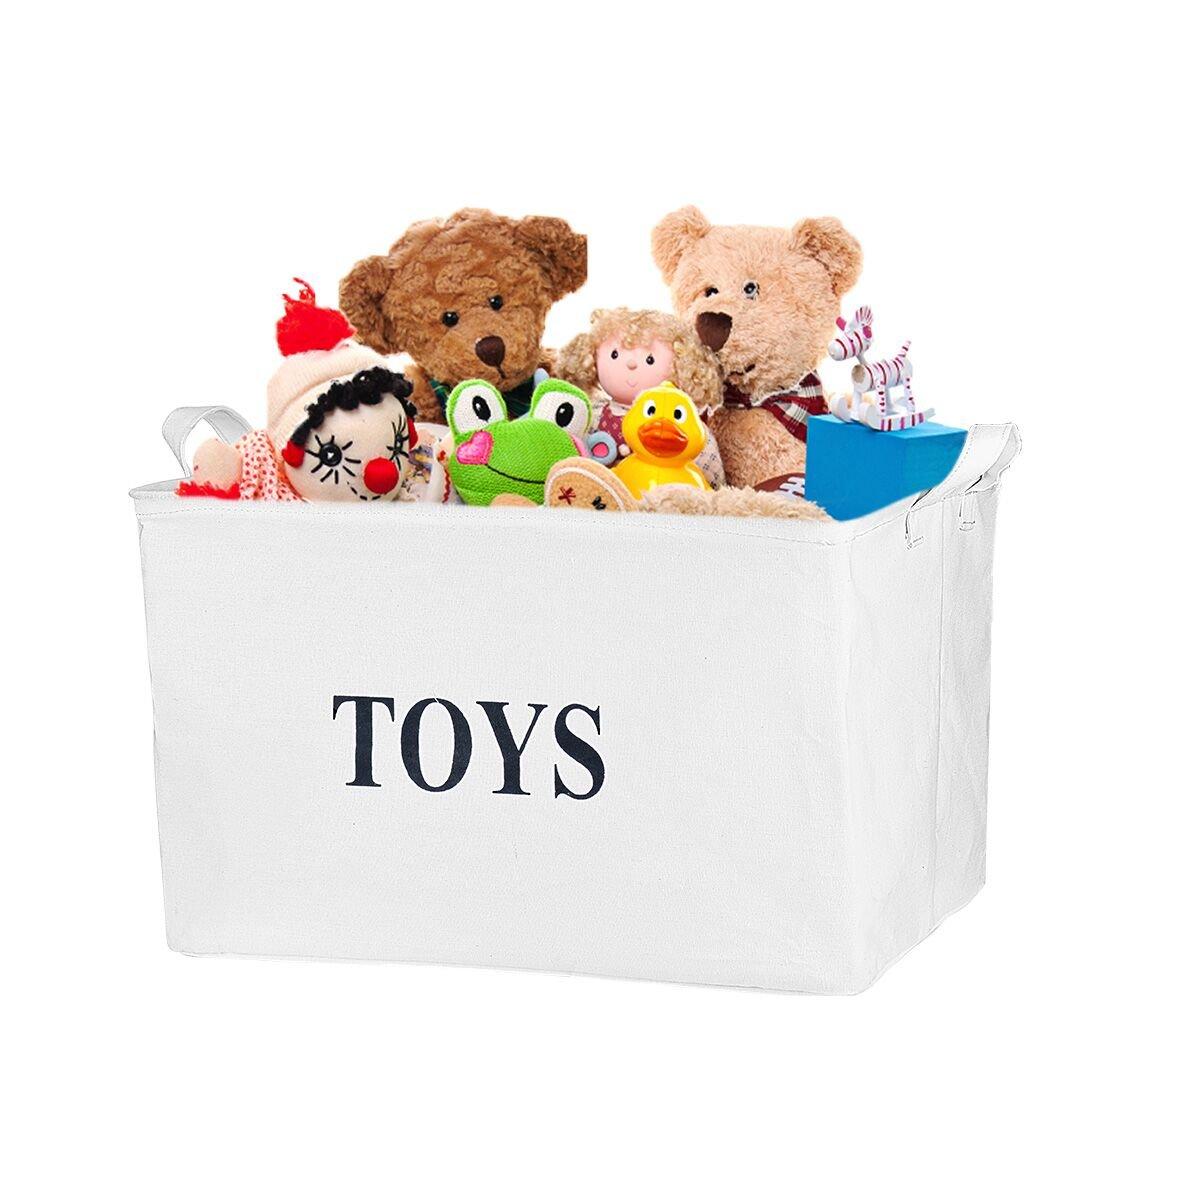 Ilyever White 17''Jute ''TOYS''Storage Basket Bin Storage Box Perfect for Organizing Baby Toys, Kids Toys, Dog Toys, Baby Clothing,Children Books